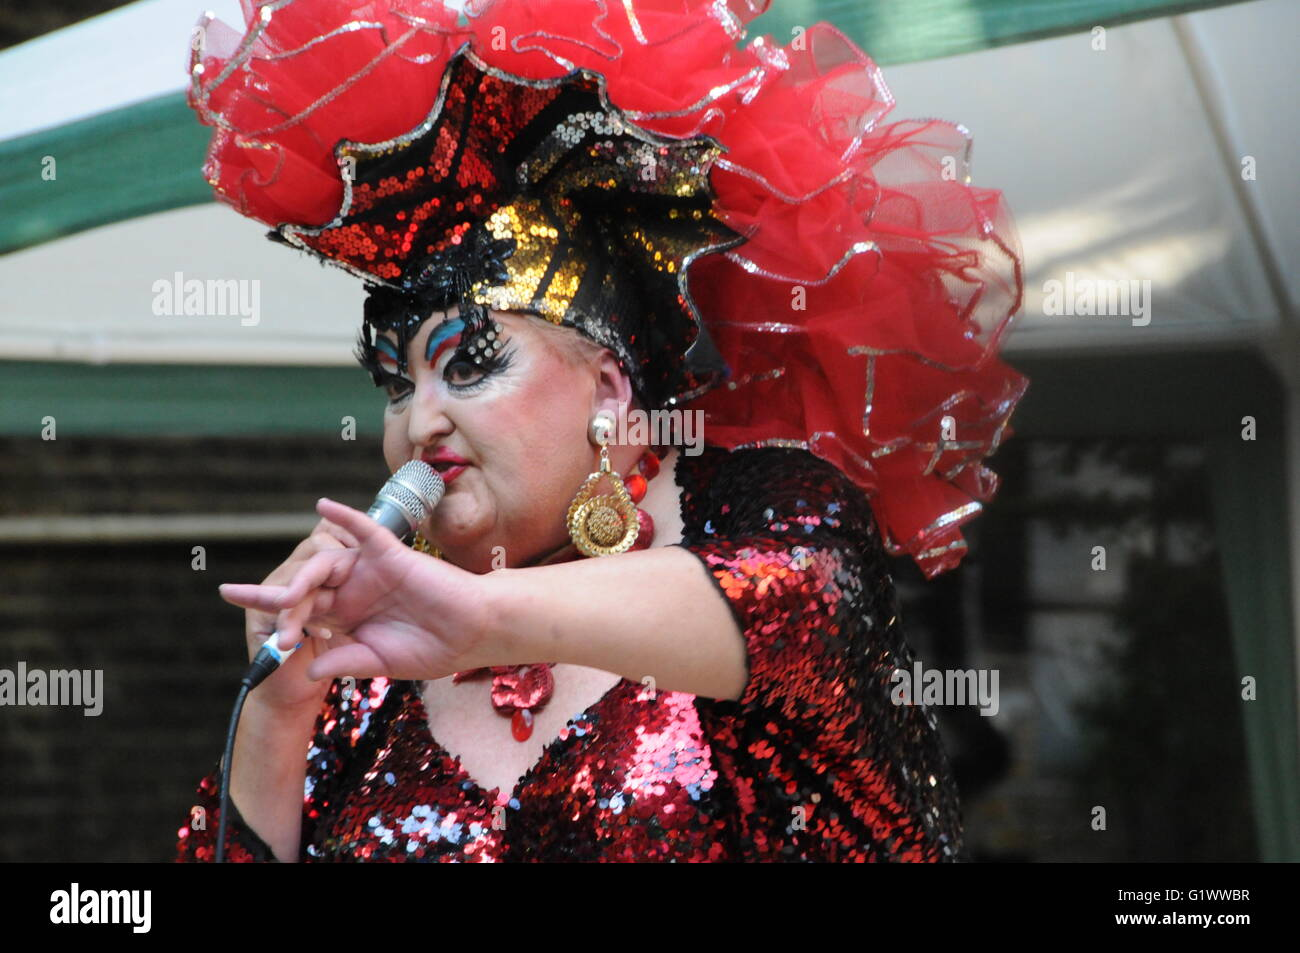 Ruby Venezuela, Drag Artiste from Soho club Madame Jo Jo's. - Stock Image